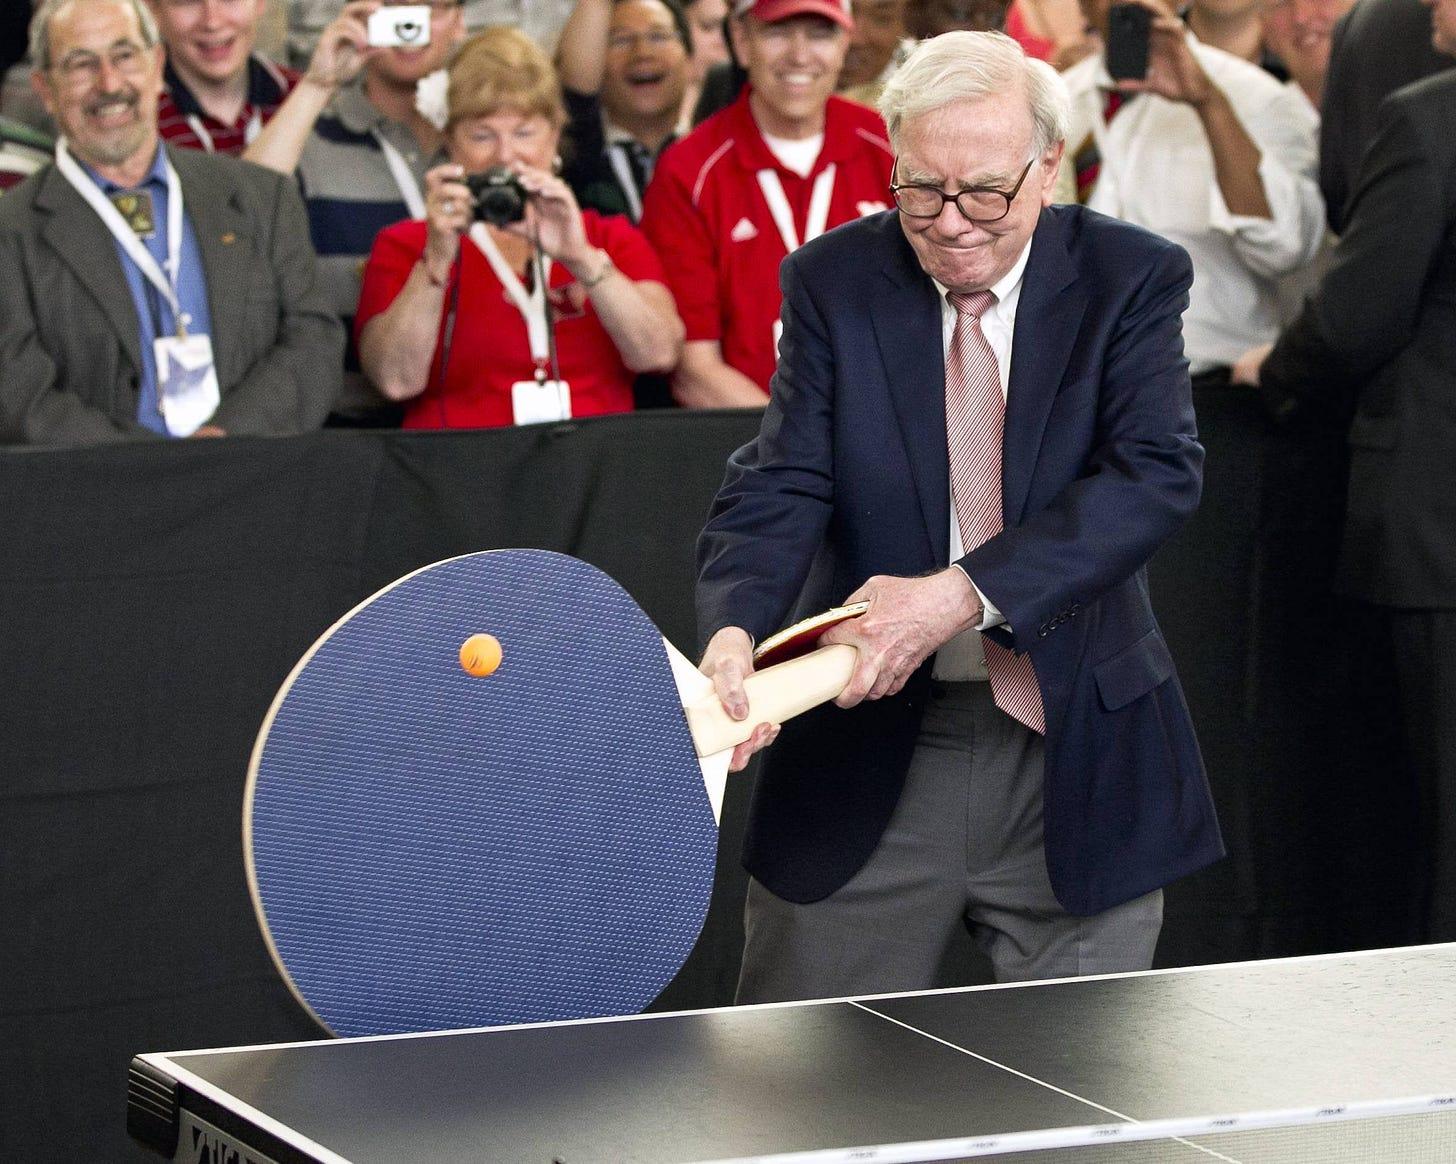 Ping Pong Level: Warren Buffett: funny